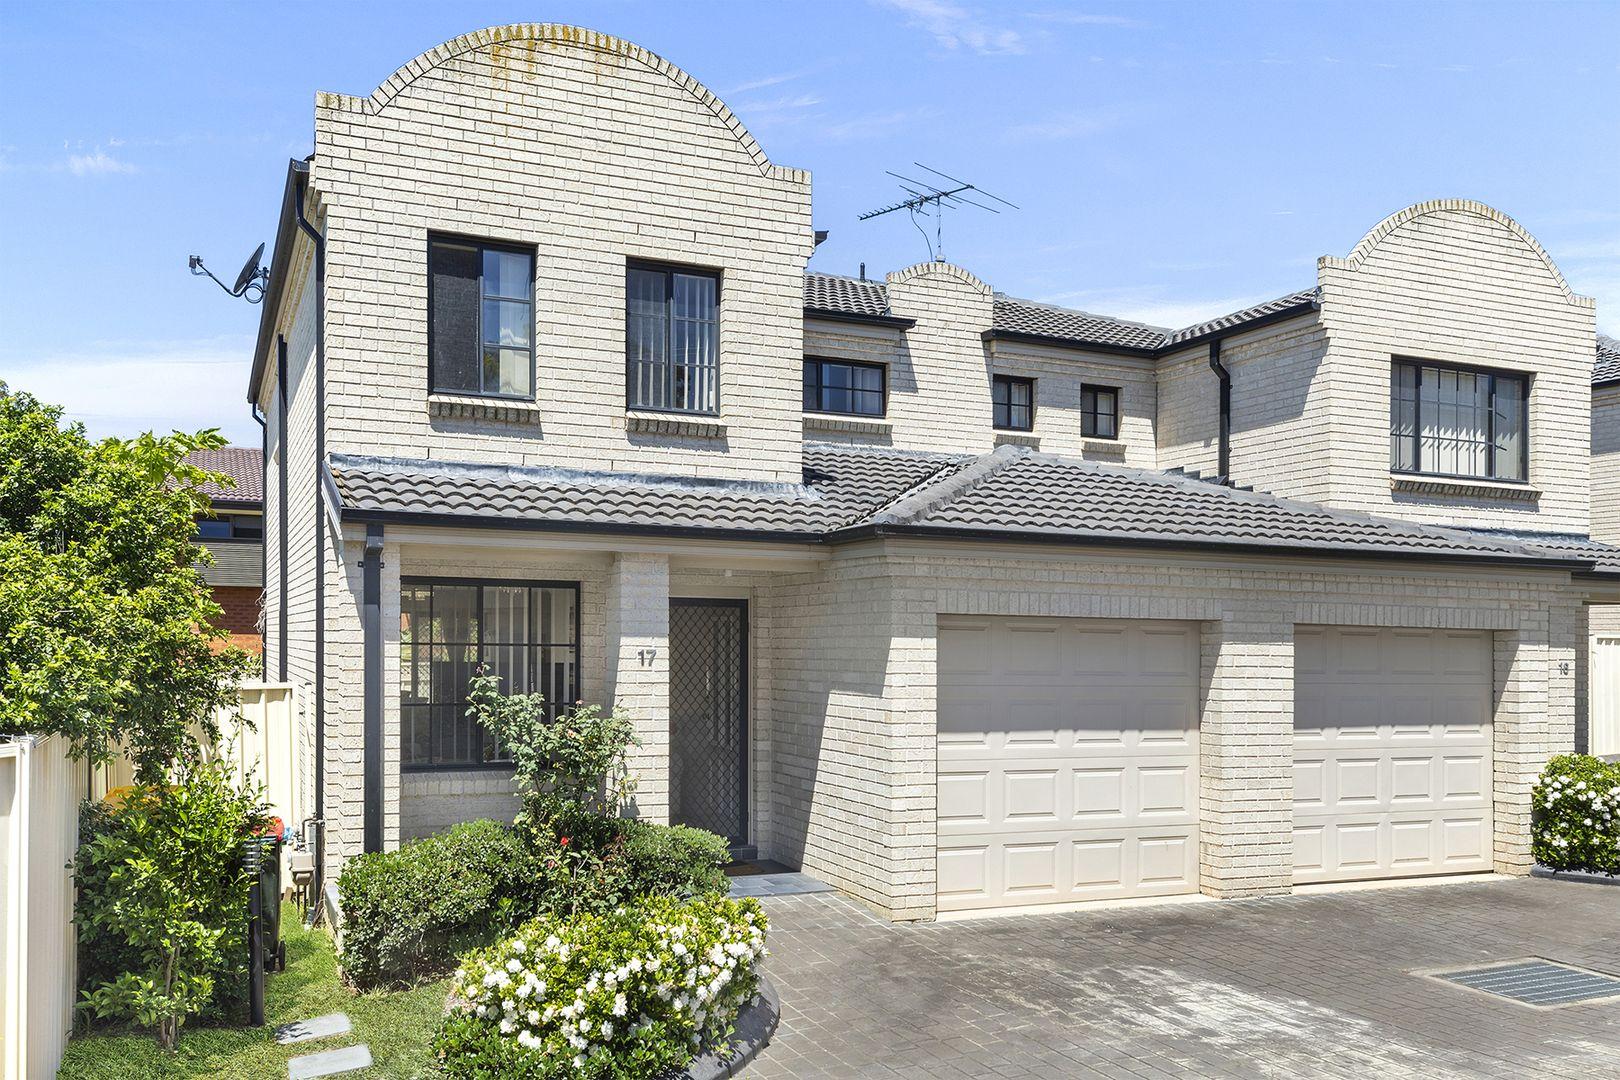 17/46-52 Wattle Road, Casula NSW 2170, Image 0